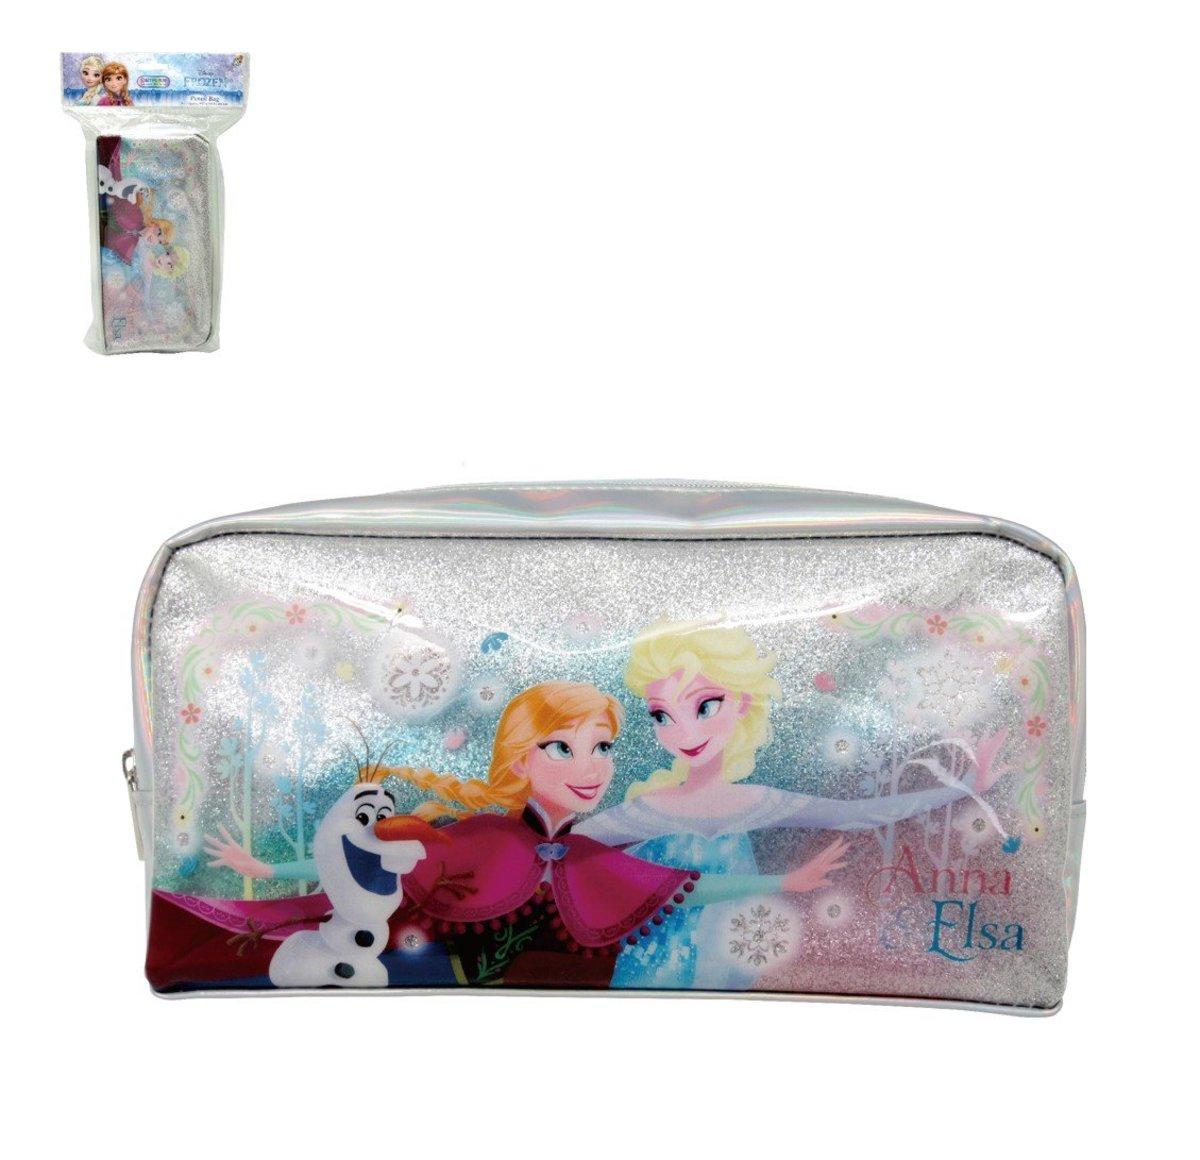 Pencil Bag (Licensed by Disney)